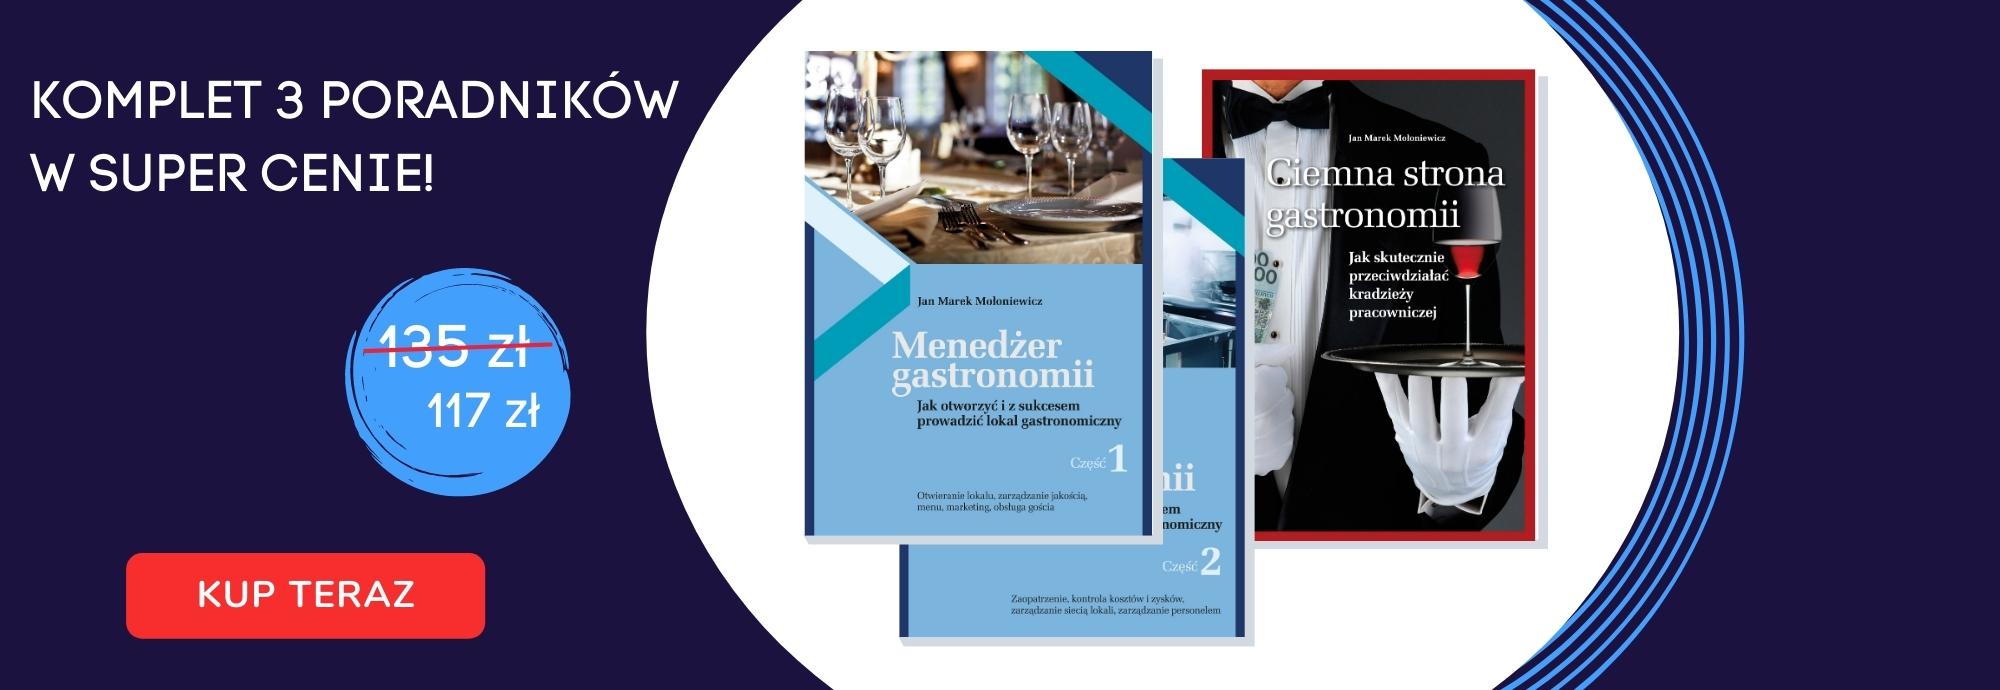 komplet okładki menedżer gastronomii i ciemna strona gastronomii